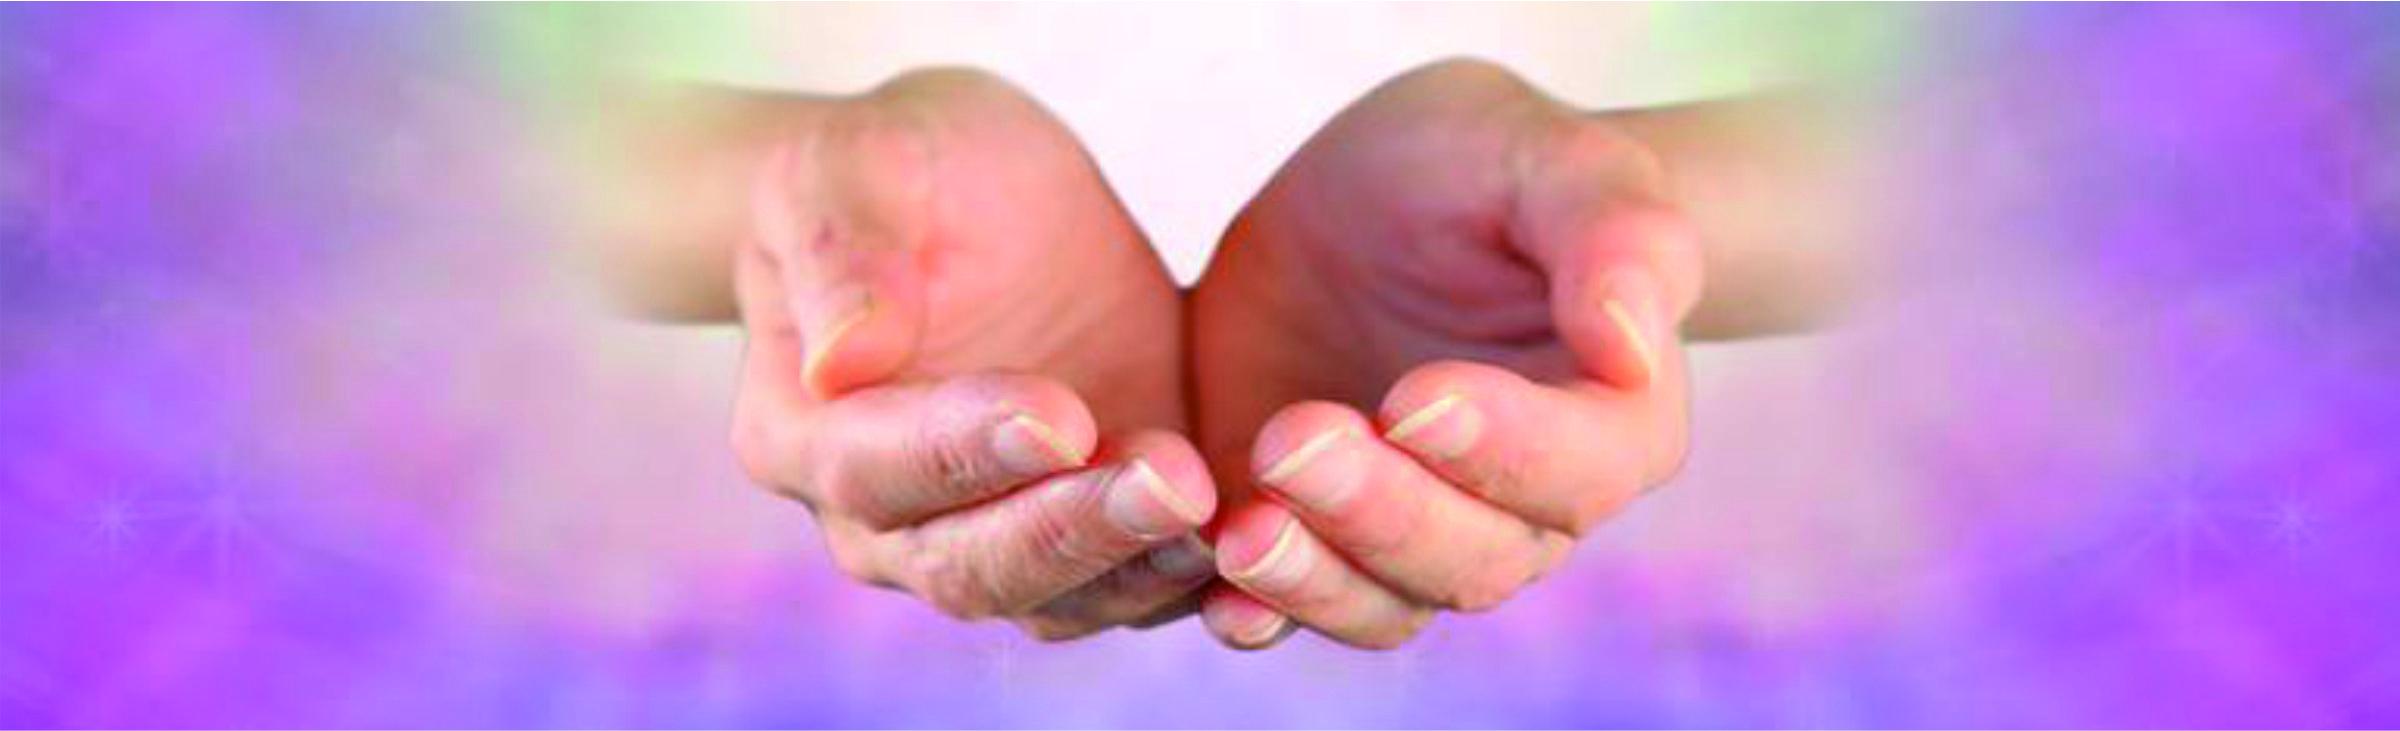 ruce-mlaskavec